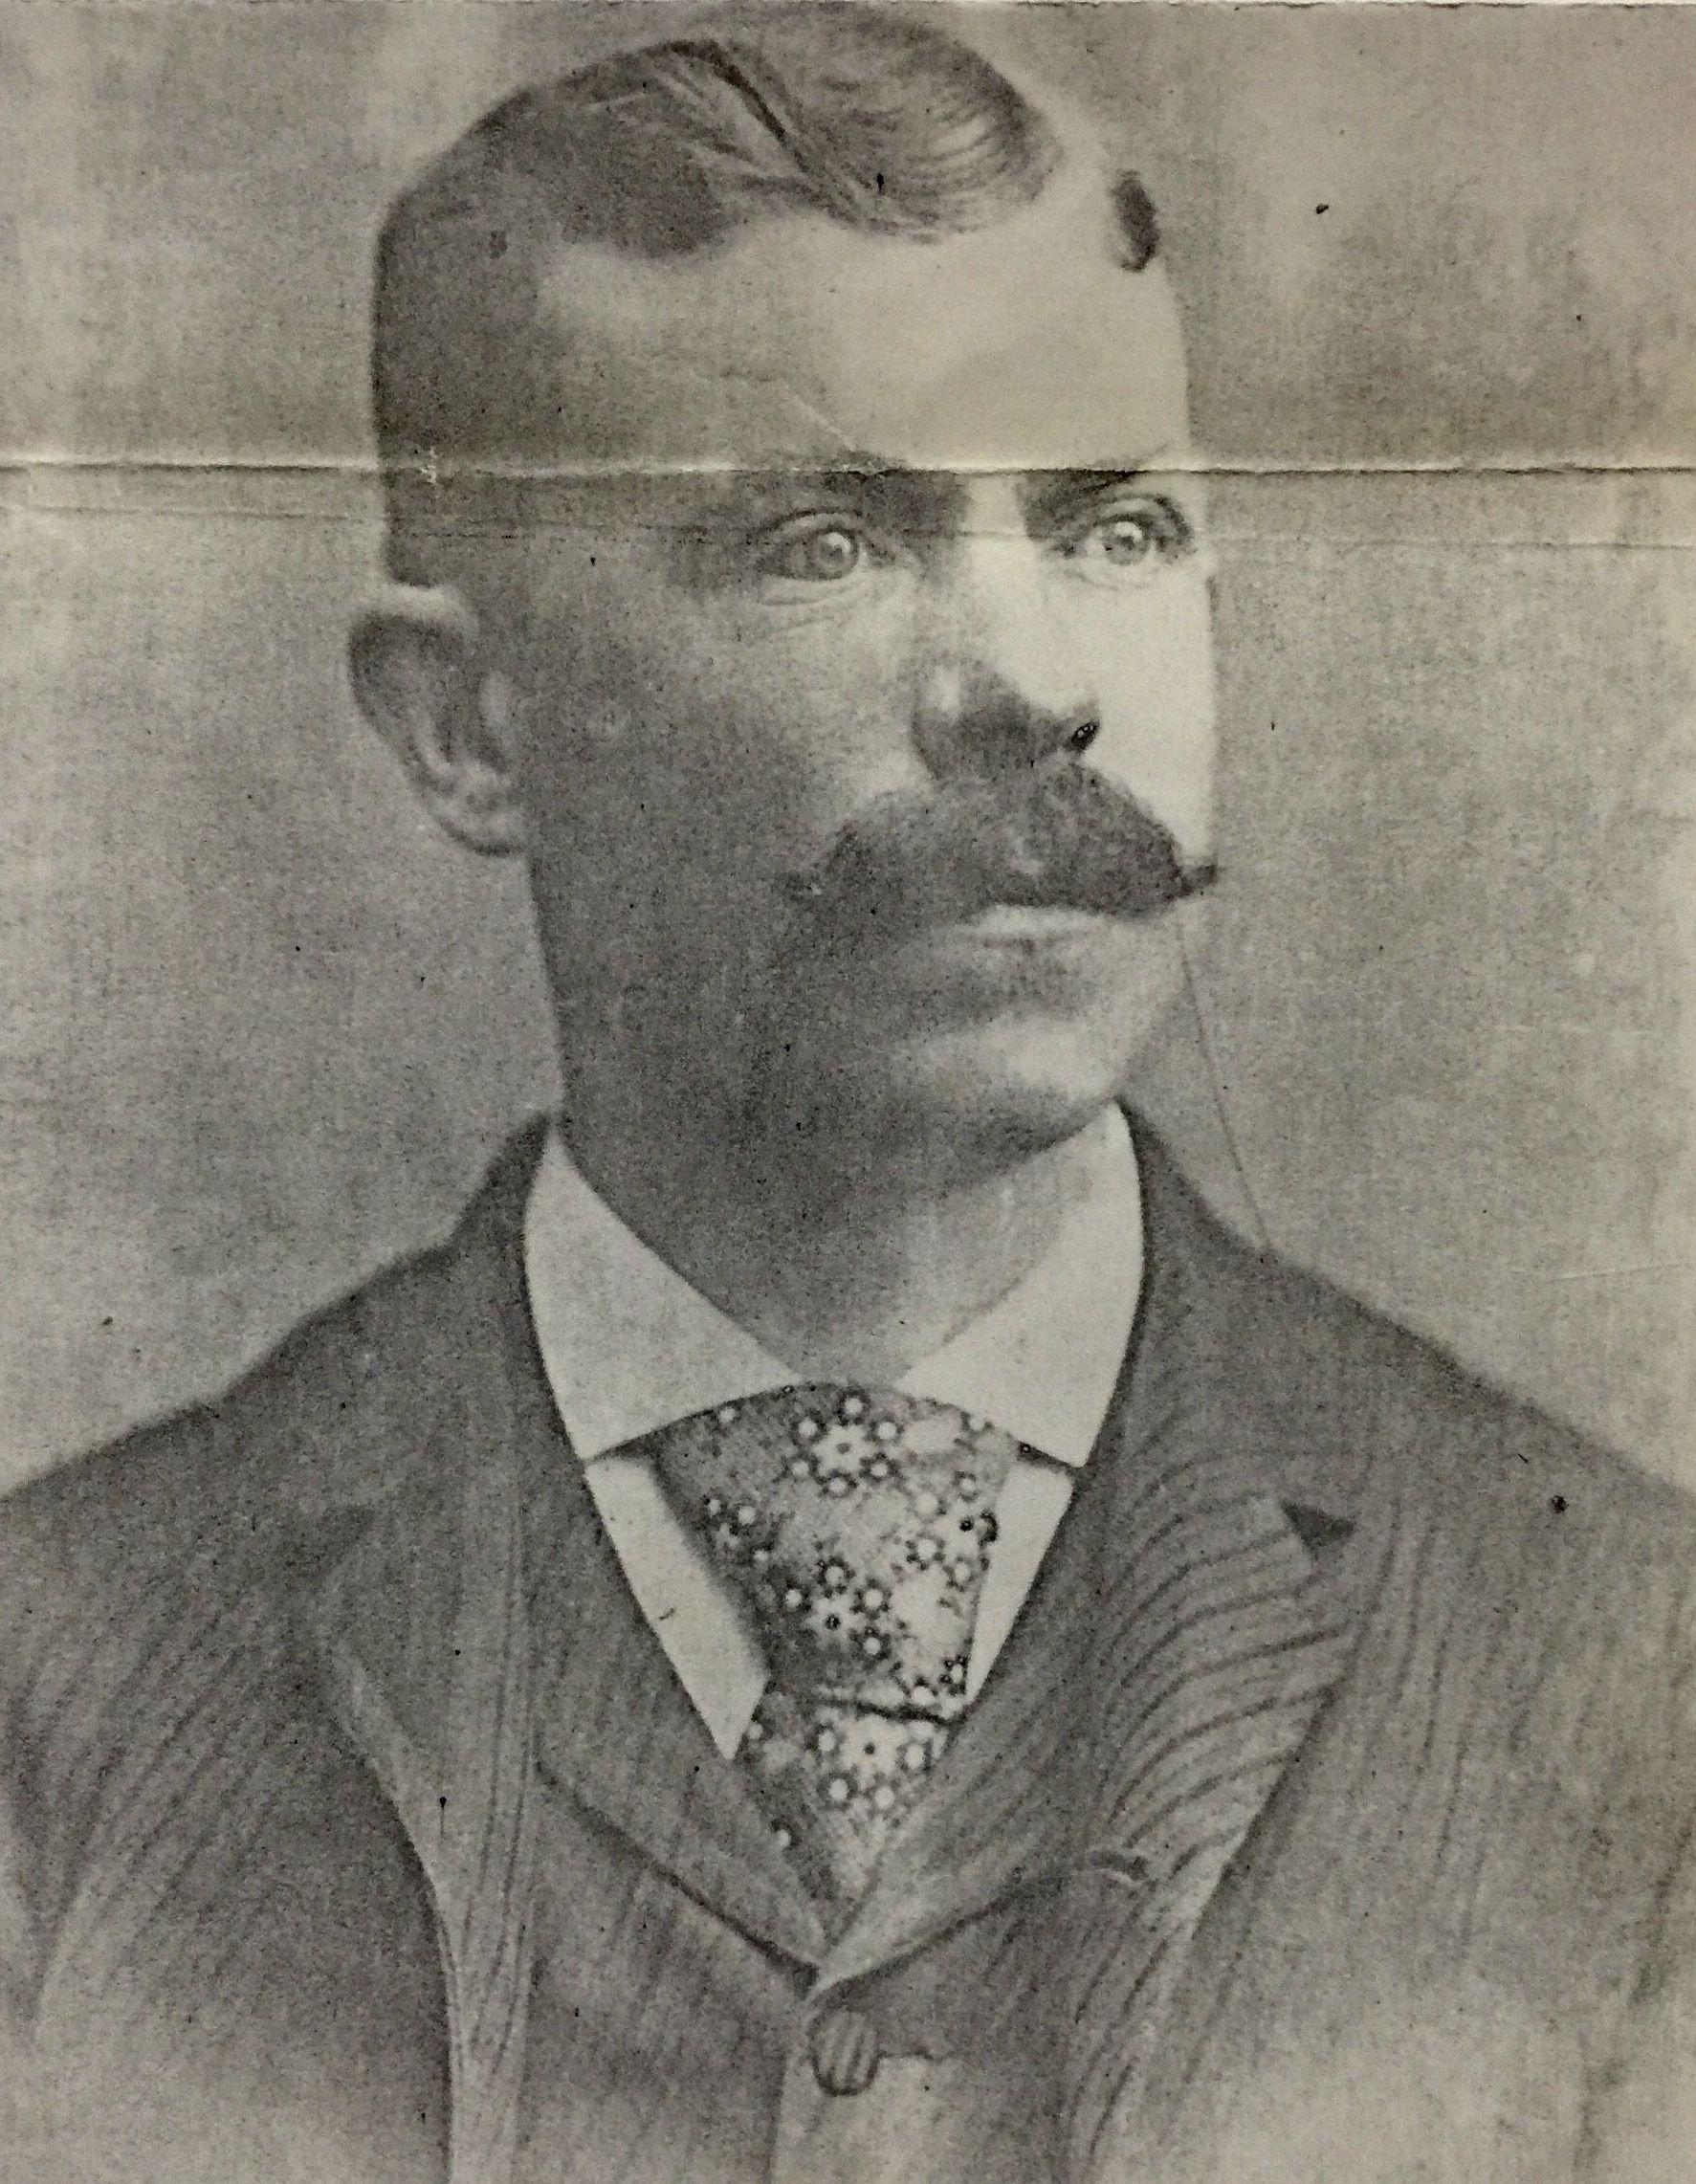 Backman, George Siegfrid